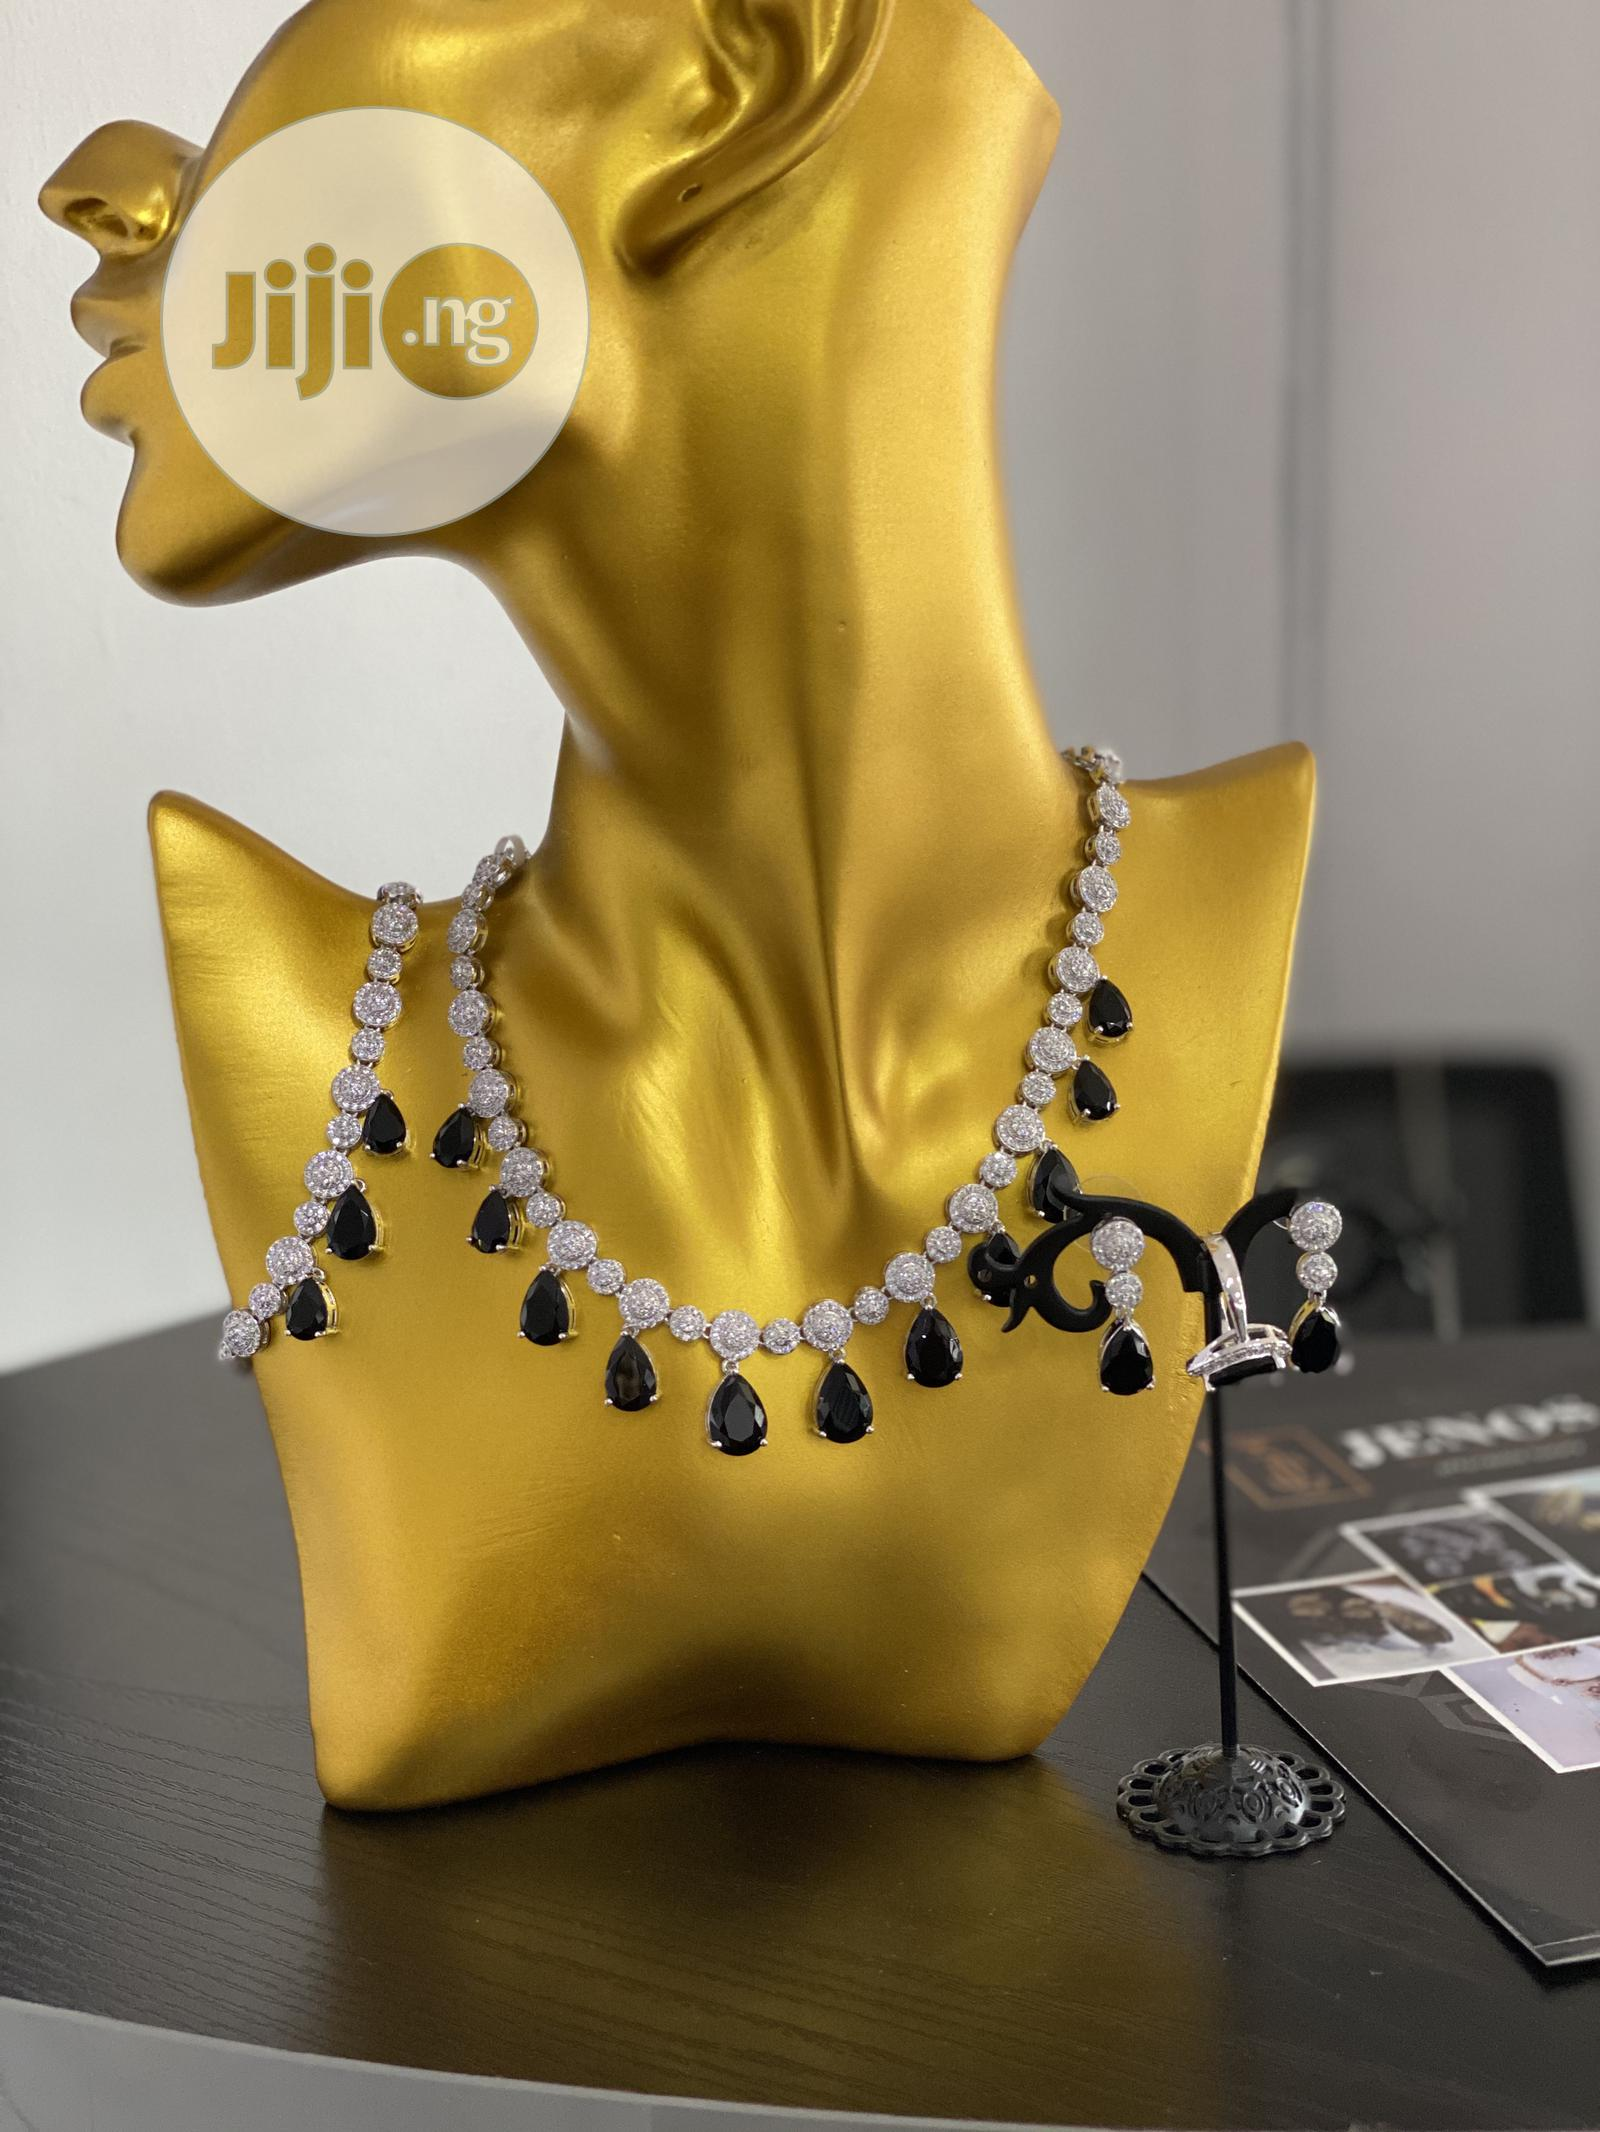 Multiple Cubic Zirconia Diamond | Jewelry for sale in Ajah, Lagos State, Nigeria